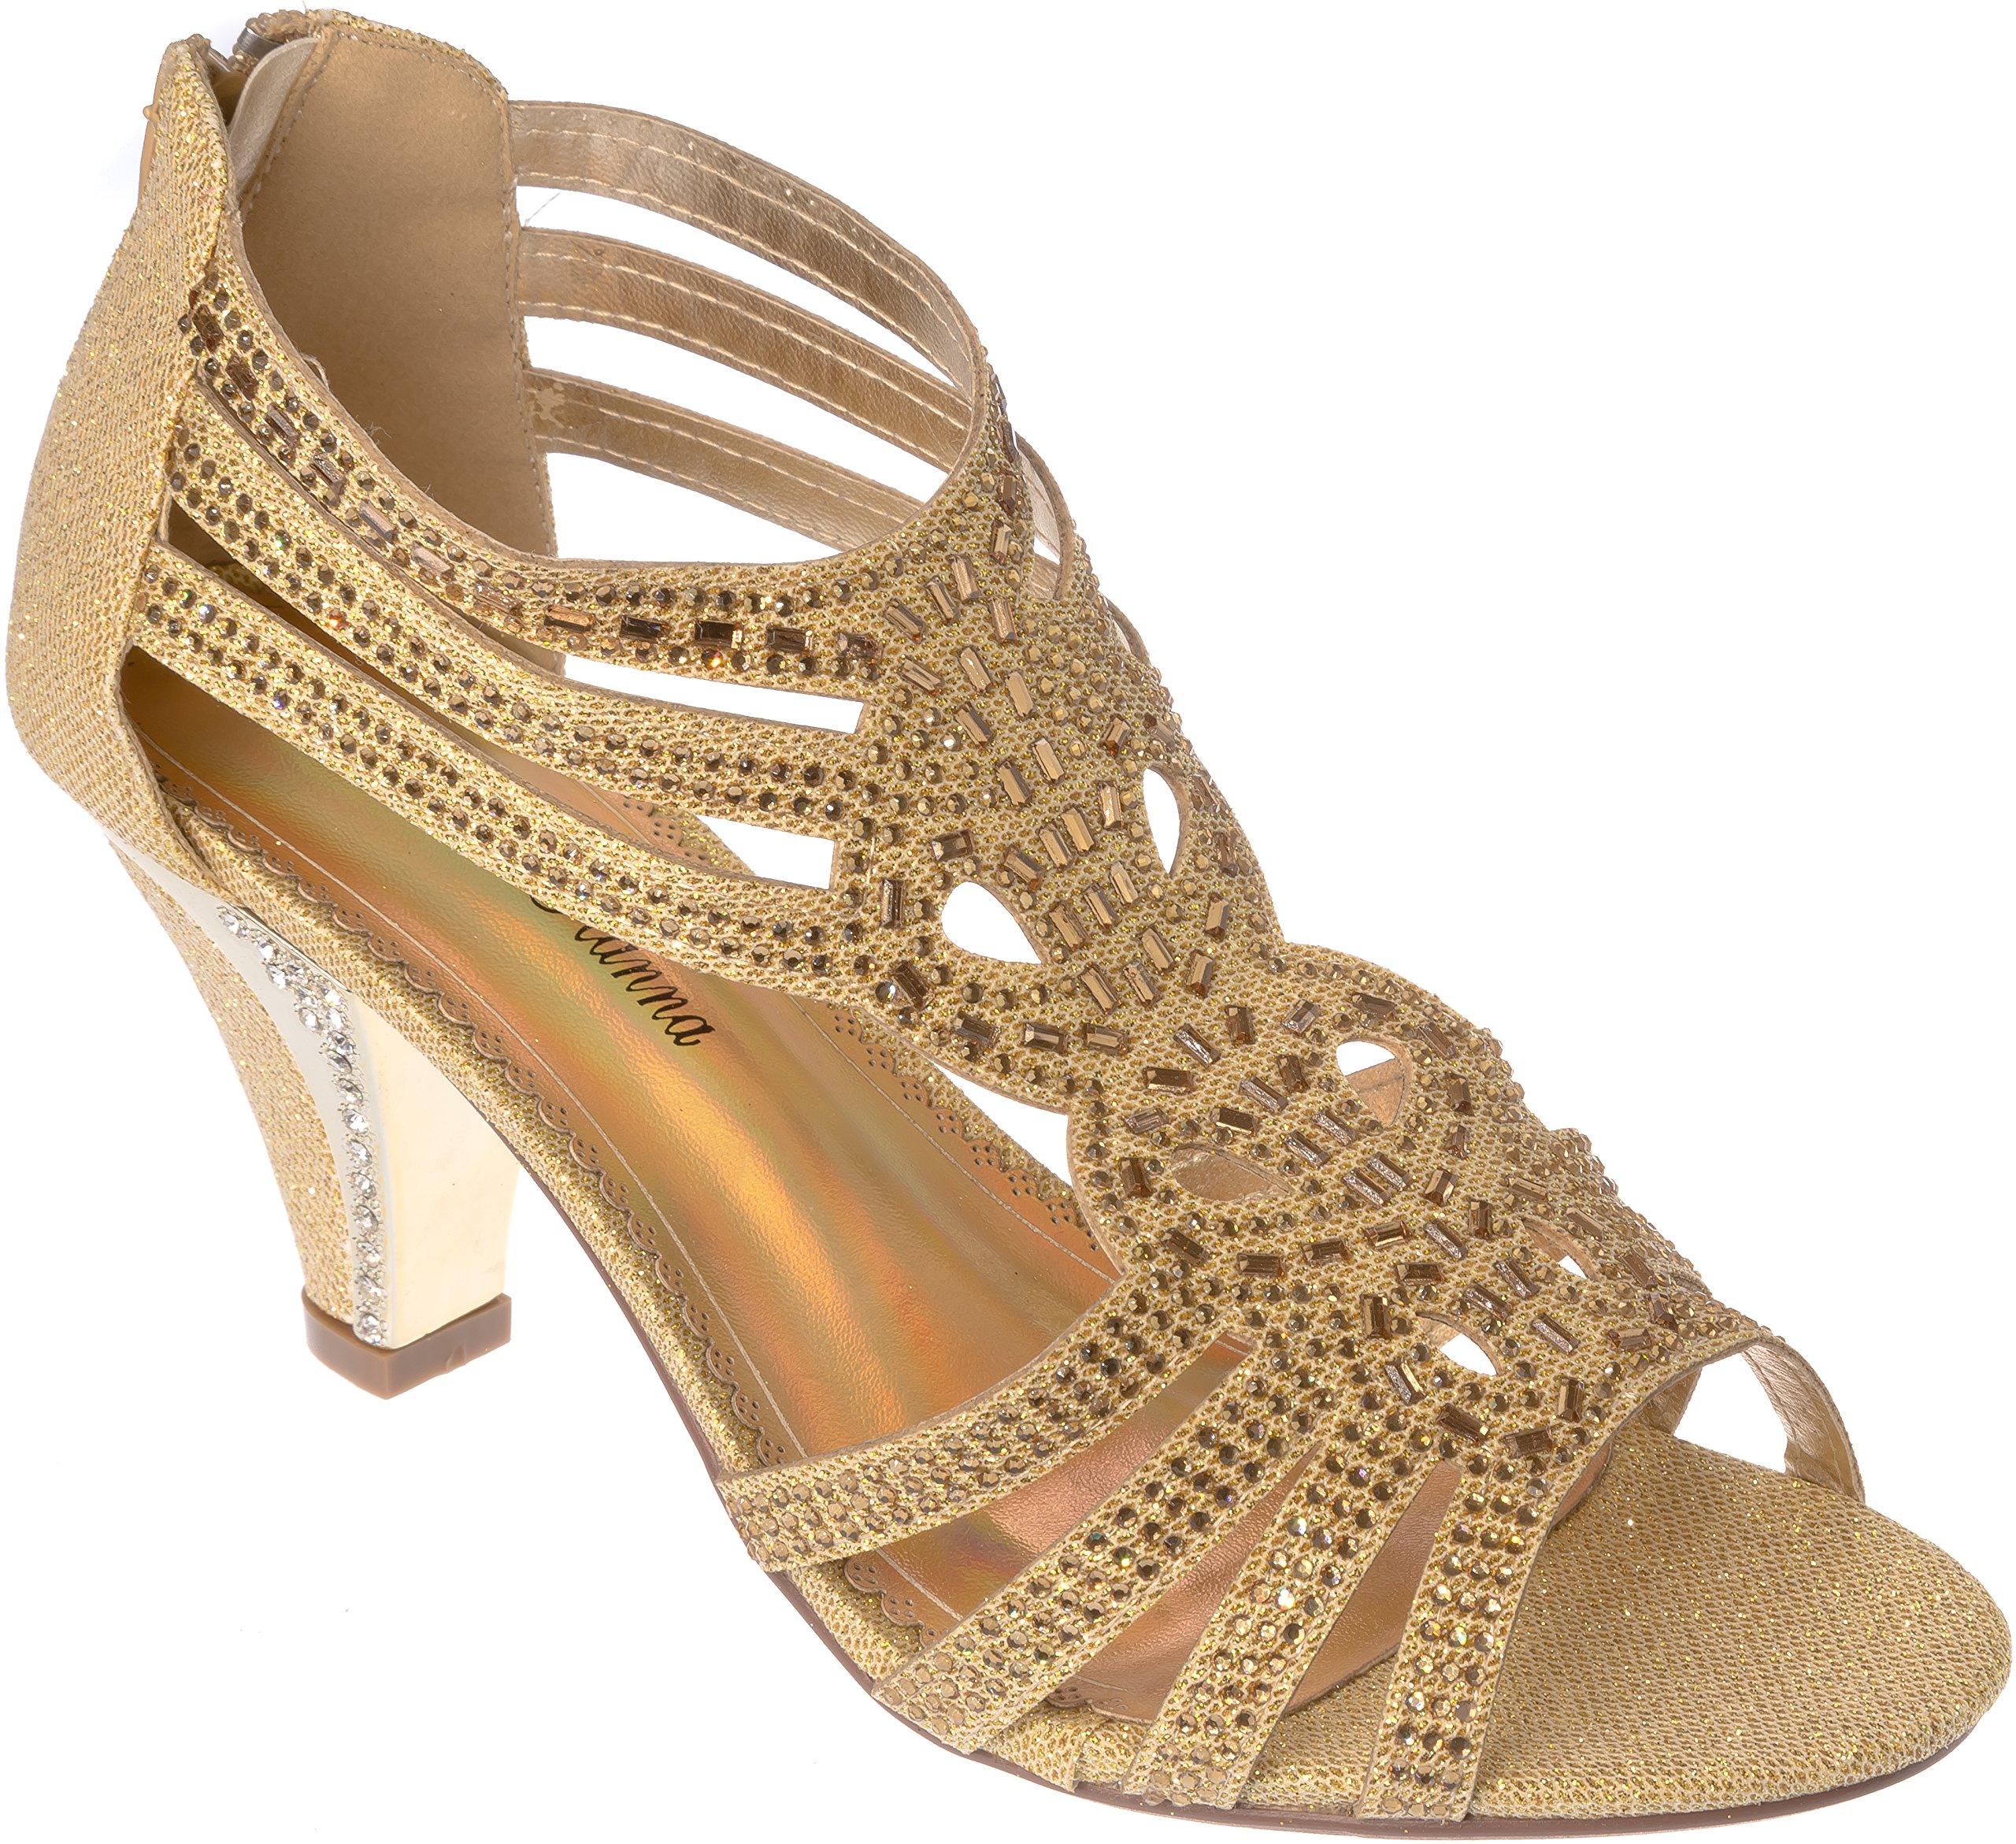 Shoes Picker kinmi25 Women Evening Sandal Rhinestone Gold Dress-Shoes Size 8.5